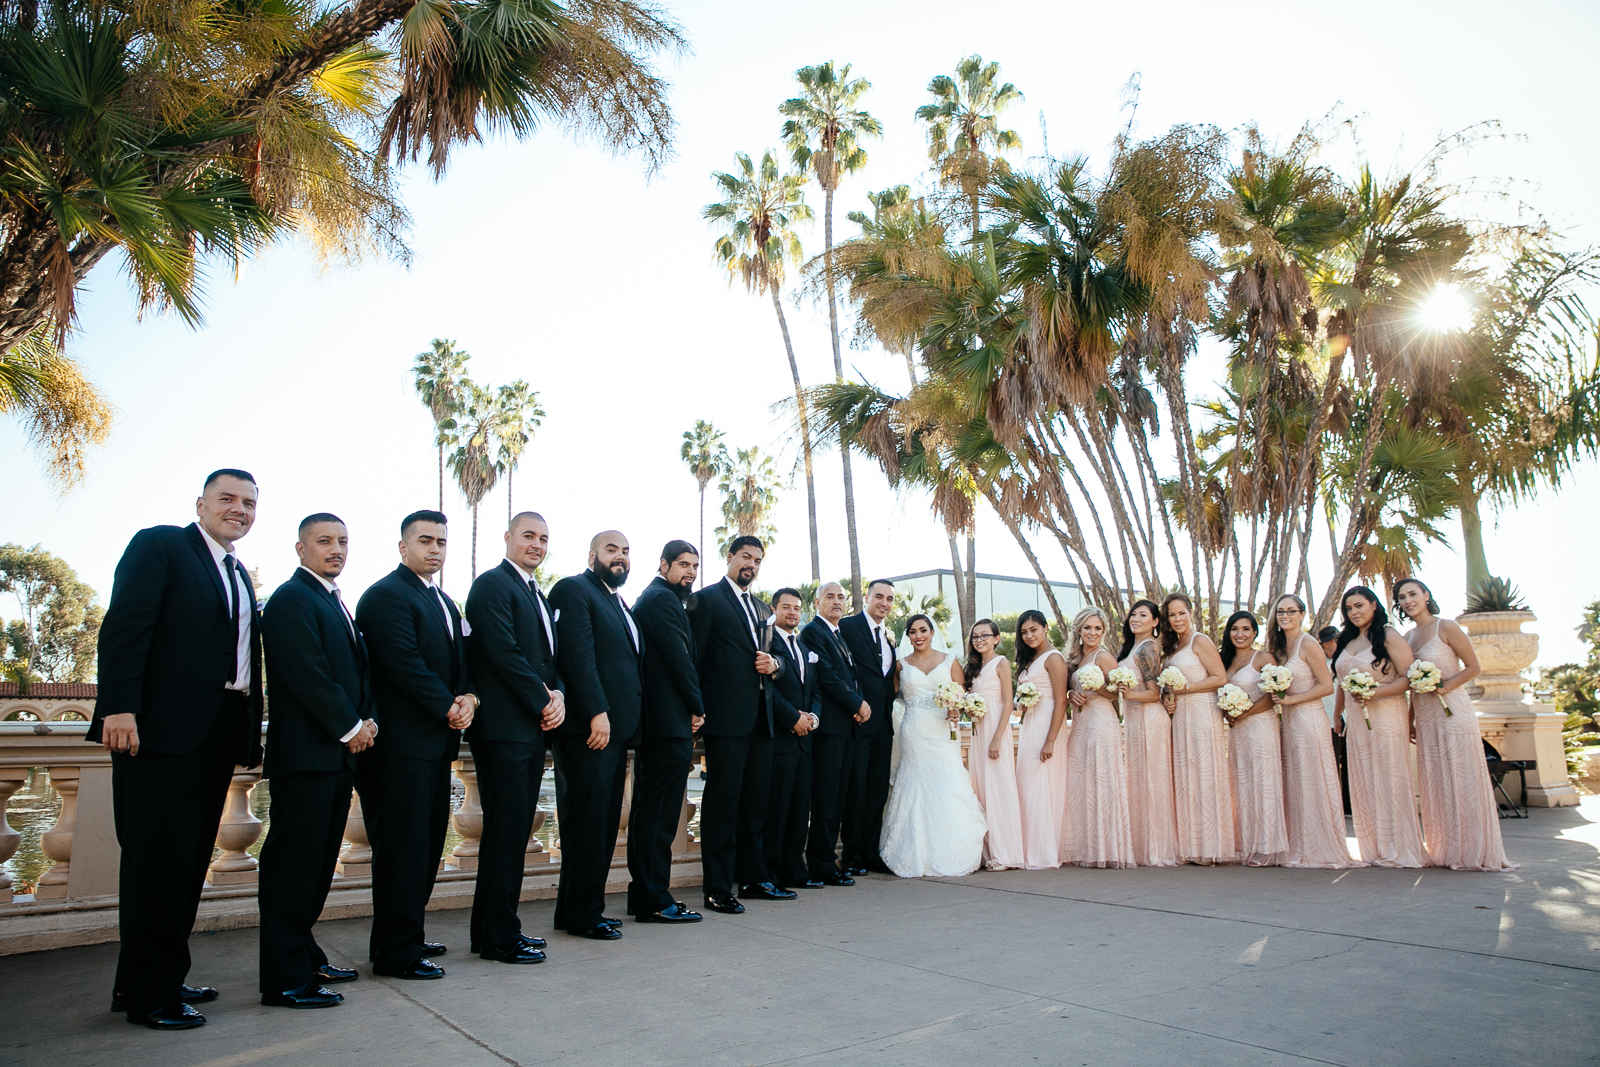 ANGELINE_&_JESUS_WEDDING_LAFAYETTE_HOTEL_2015_2015_IMG_3305.JPG